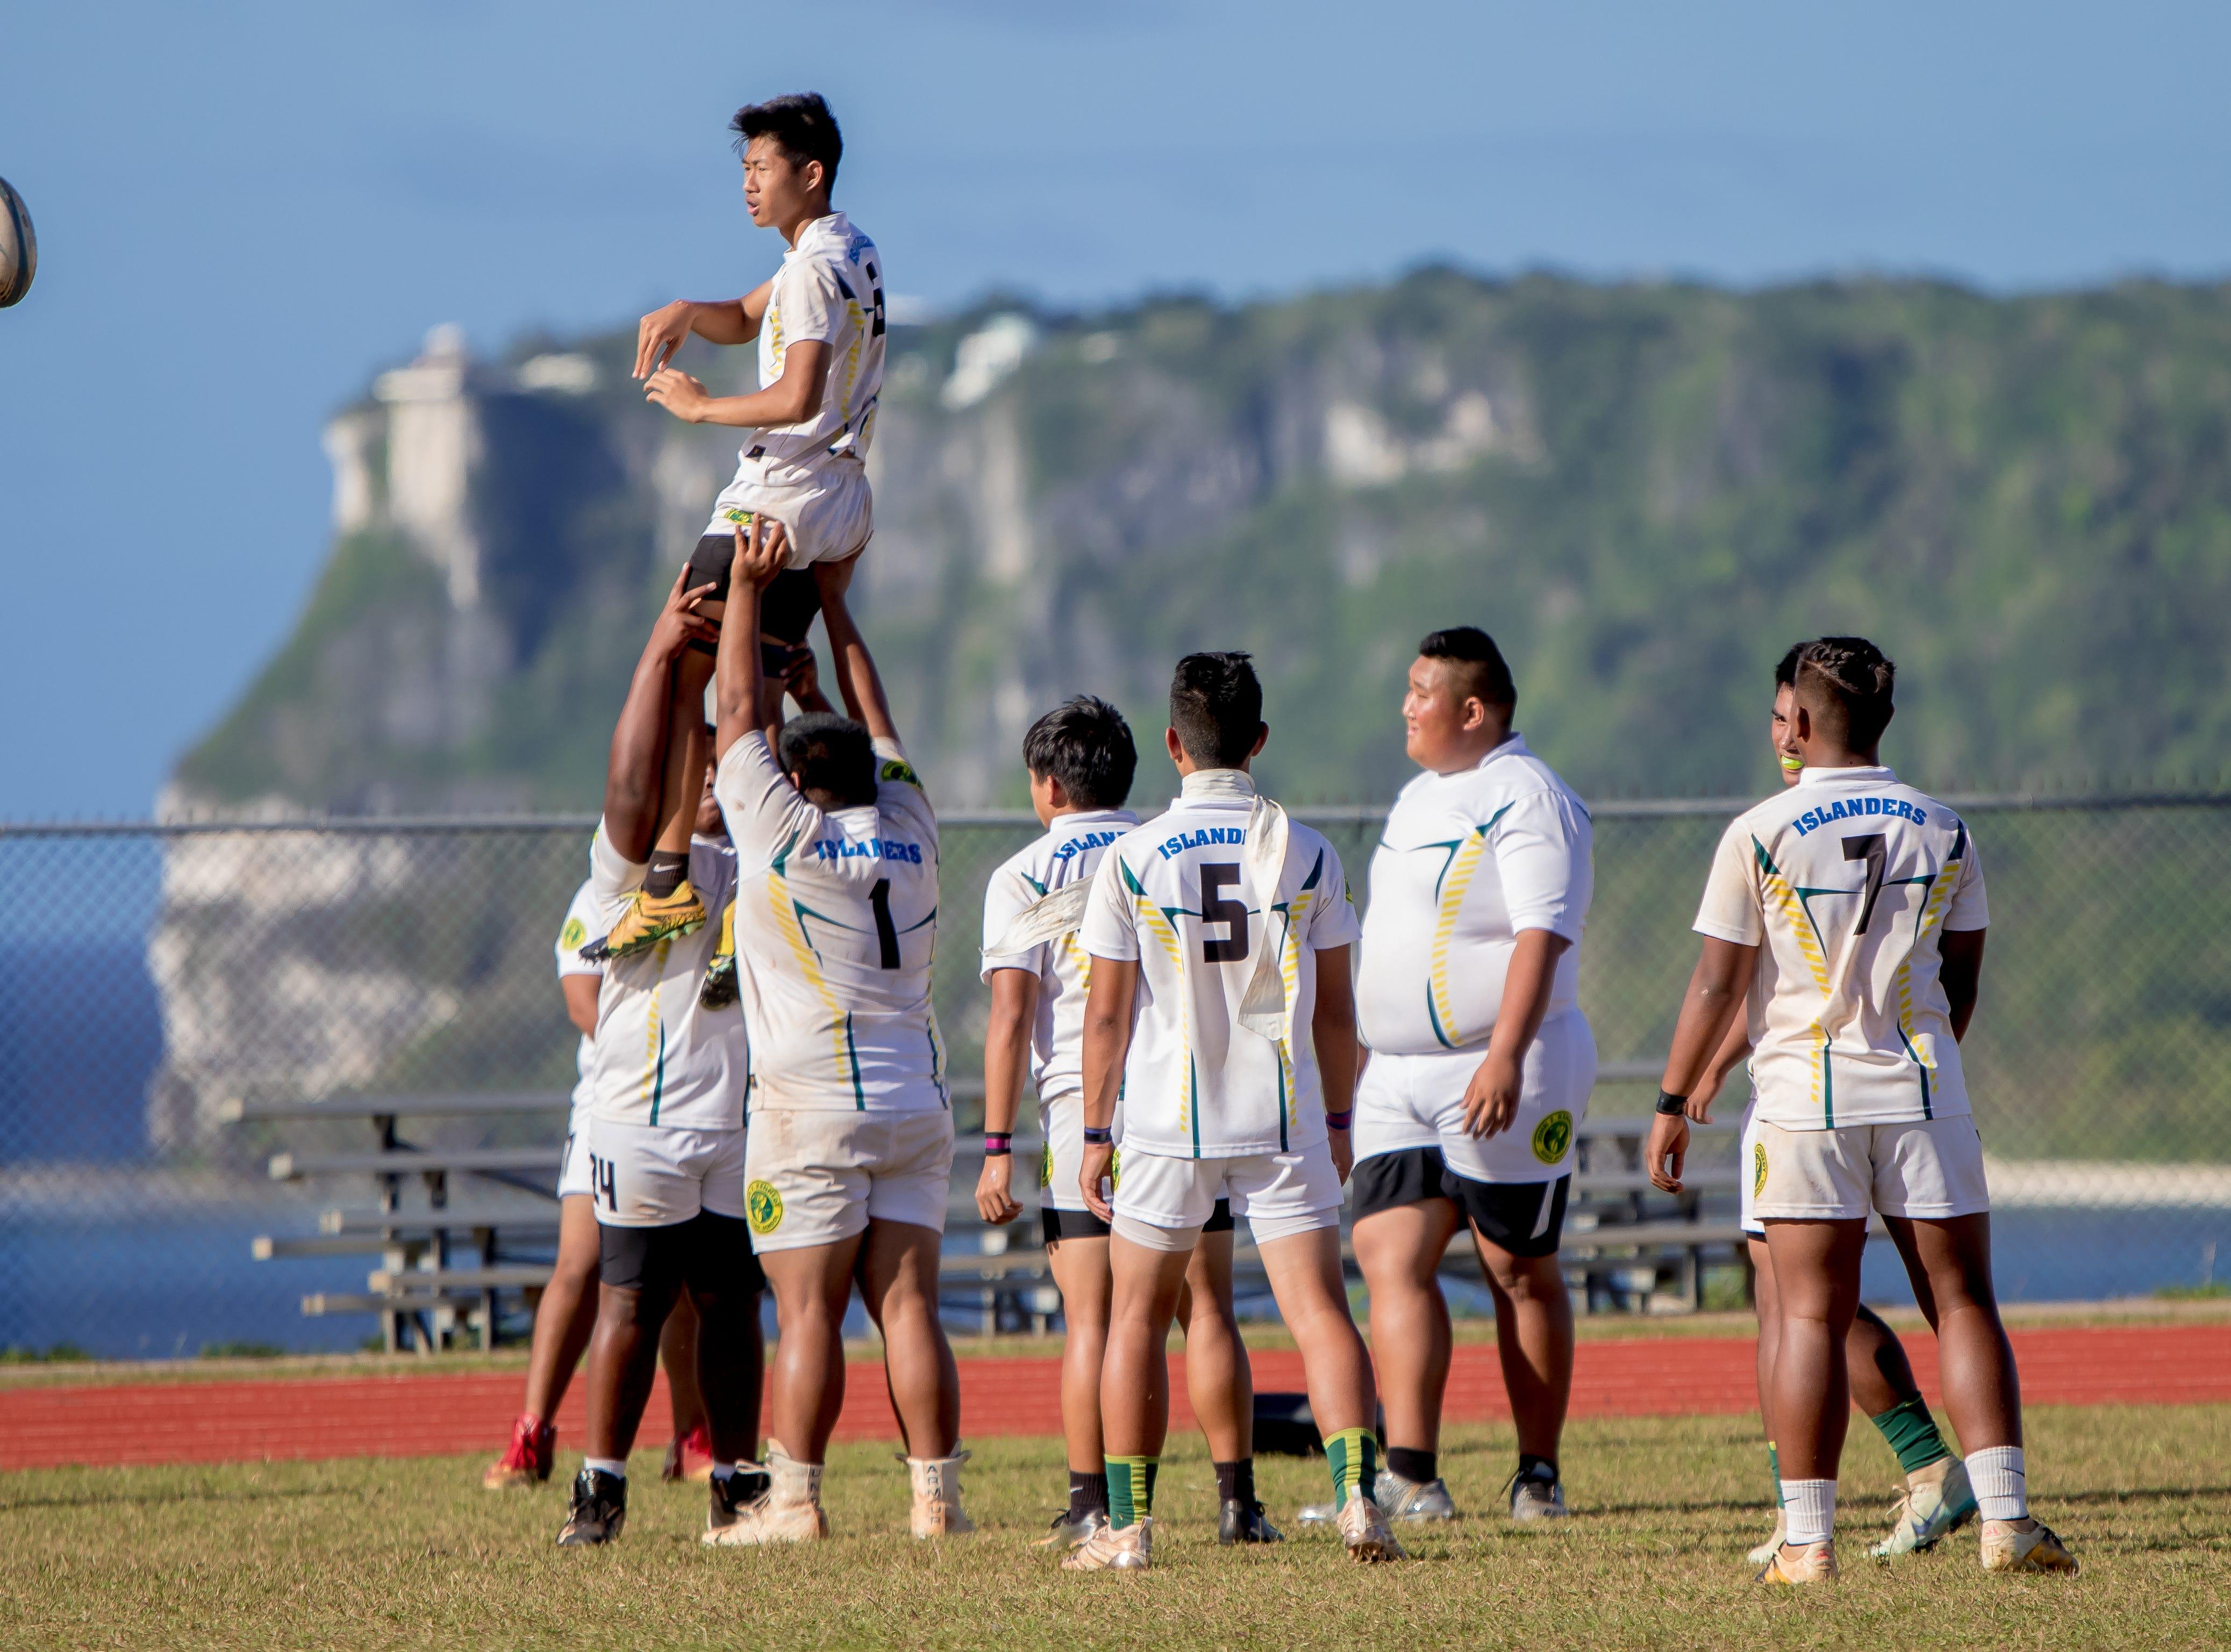 John F. Kennedy High School rugby players warm up for a match against Okkodo High School in an IIAAG/GRFU Boys Rugby match at Ramsey Field on March 6.